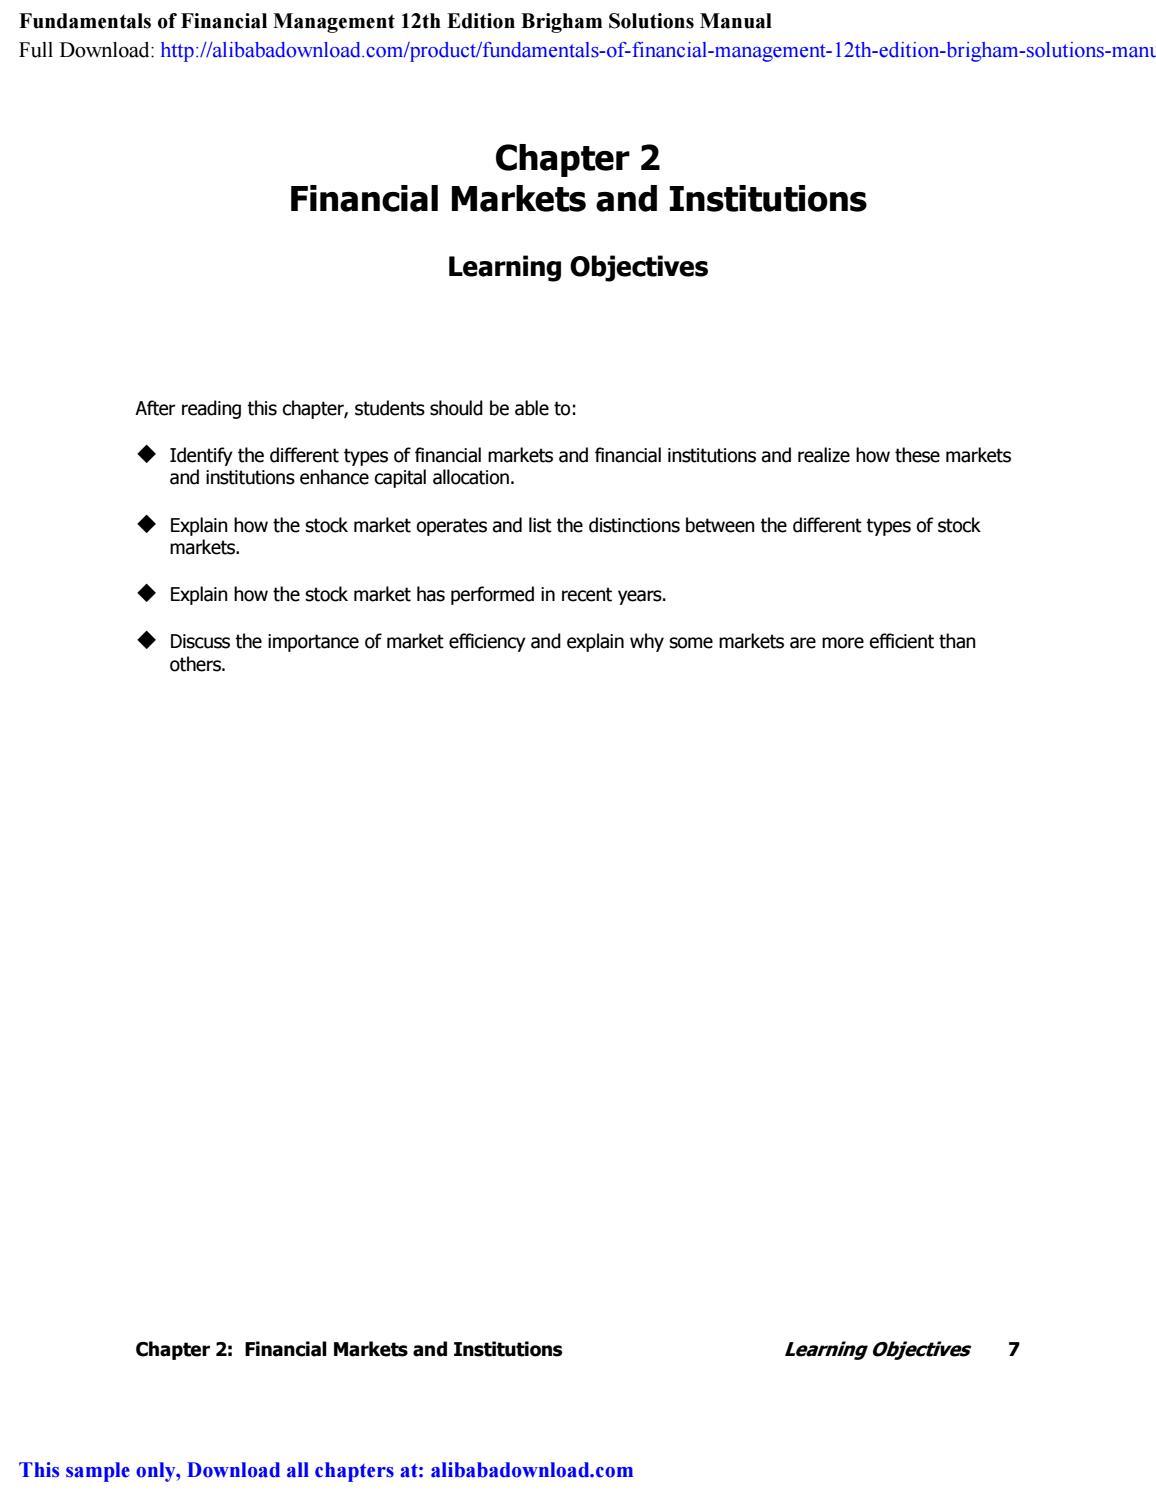 Fundamentals of Financial Management 12th Edition Brigham Solutions